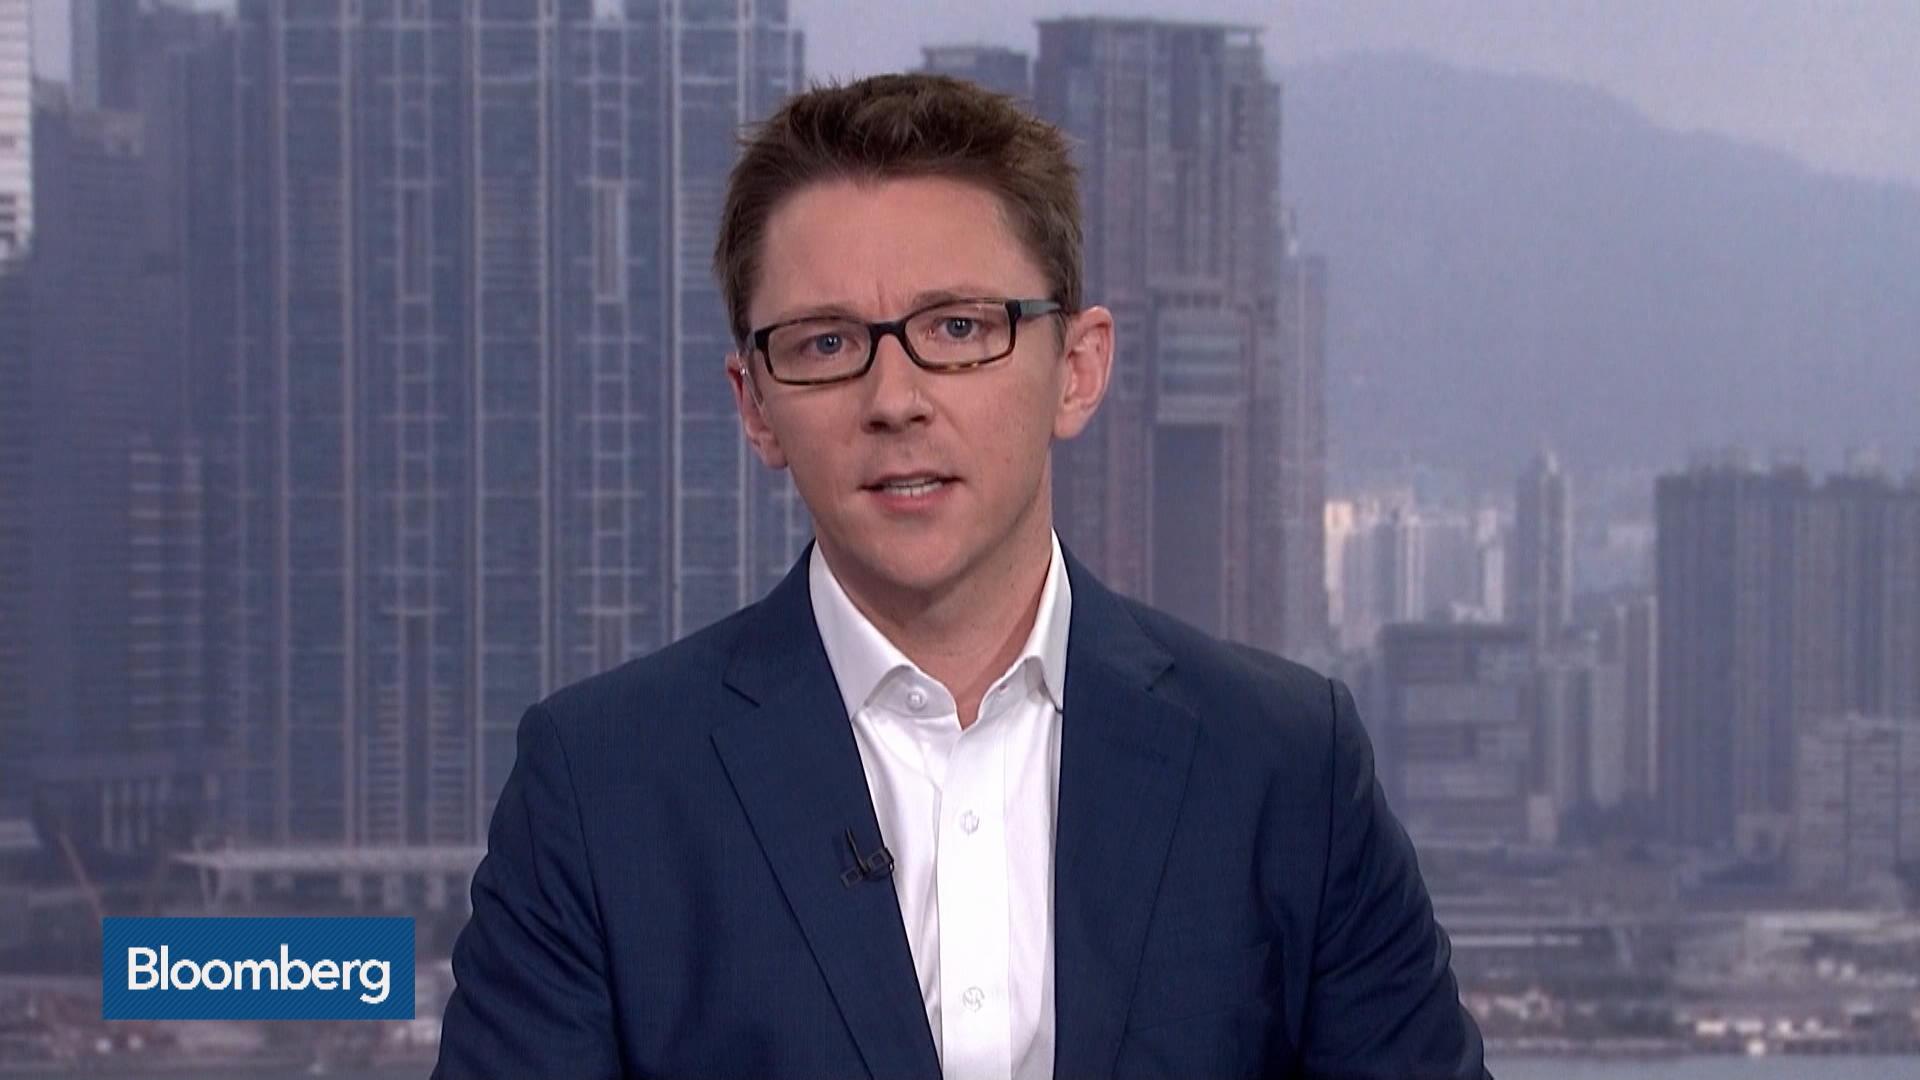 Euan Mcleish, Analyst at Sanford C Bernstein, on AB InBev's Asia Unit IPO Plan